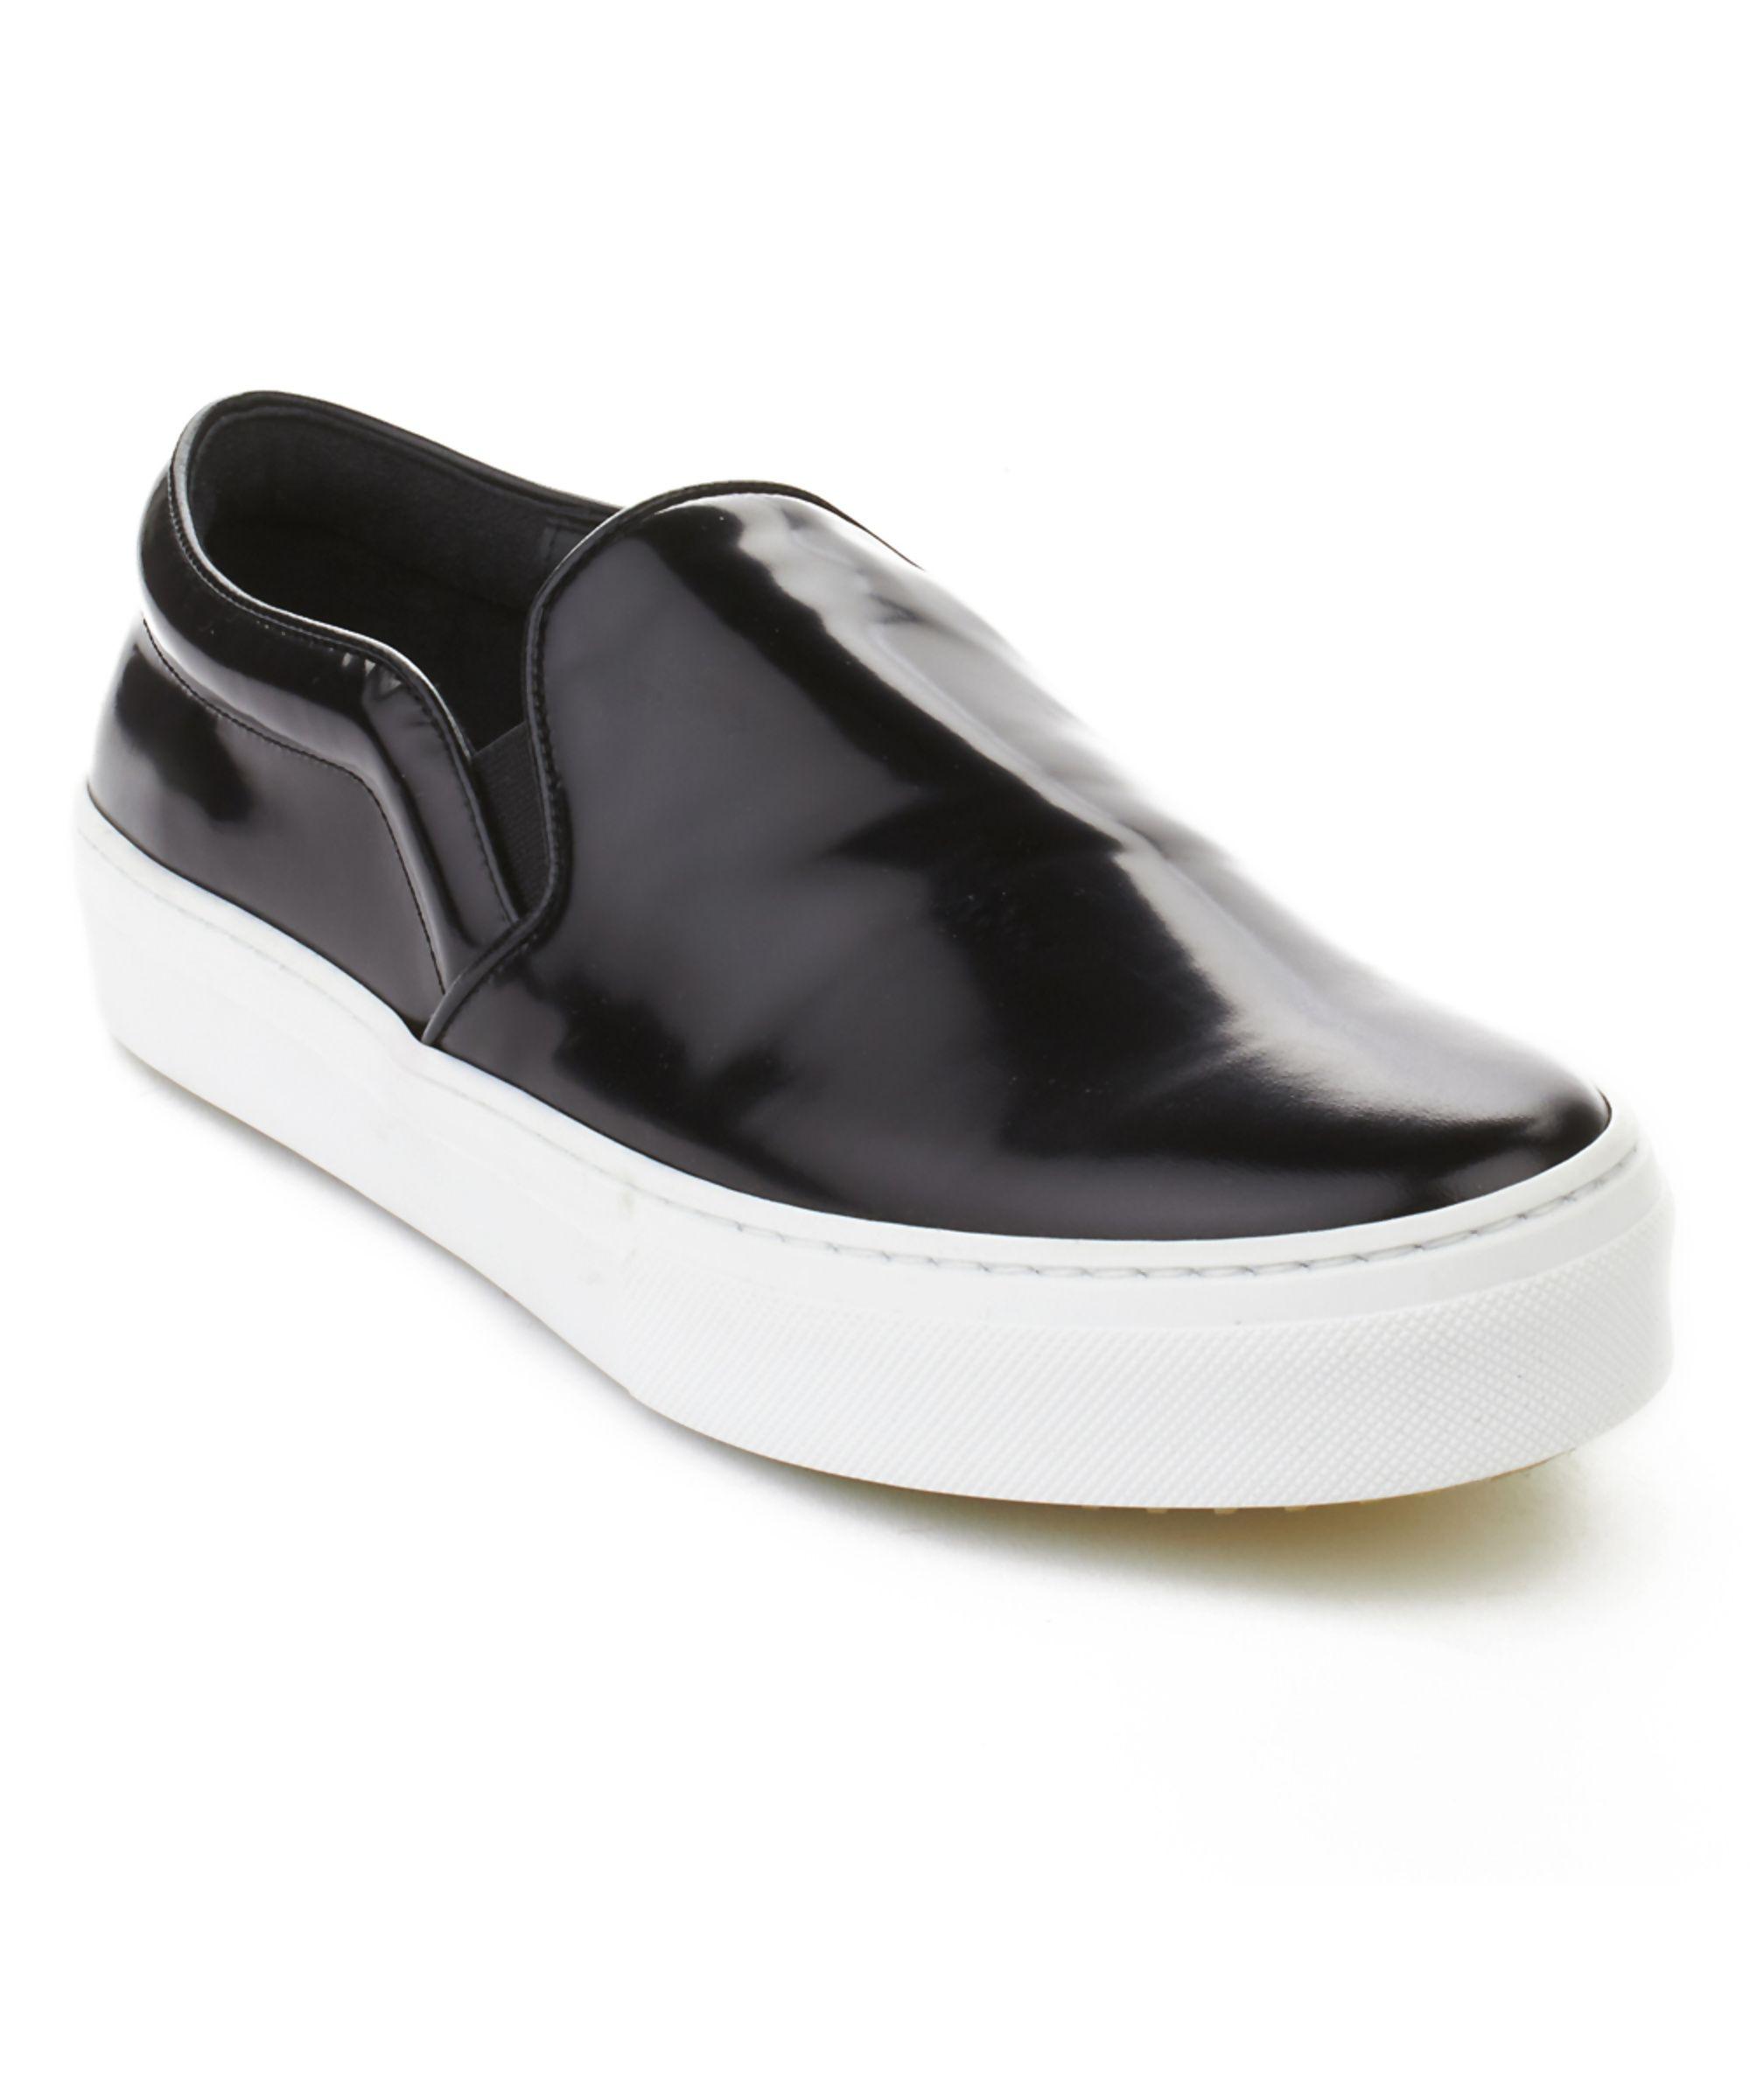 Céline Women's Patent Leather Slip-On